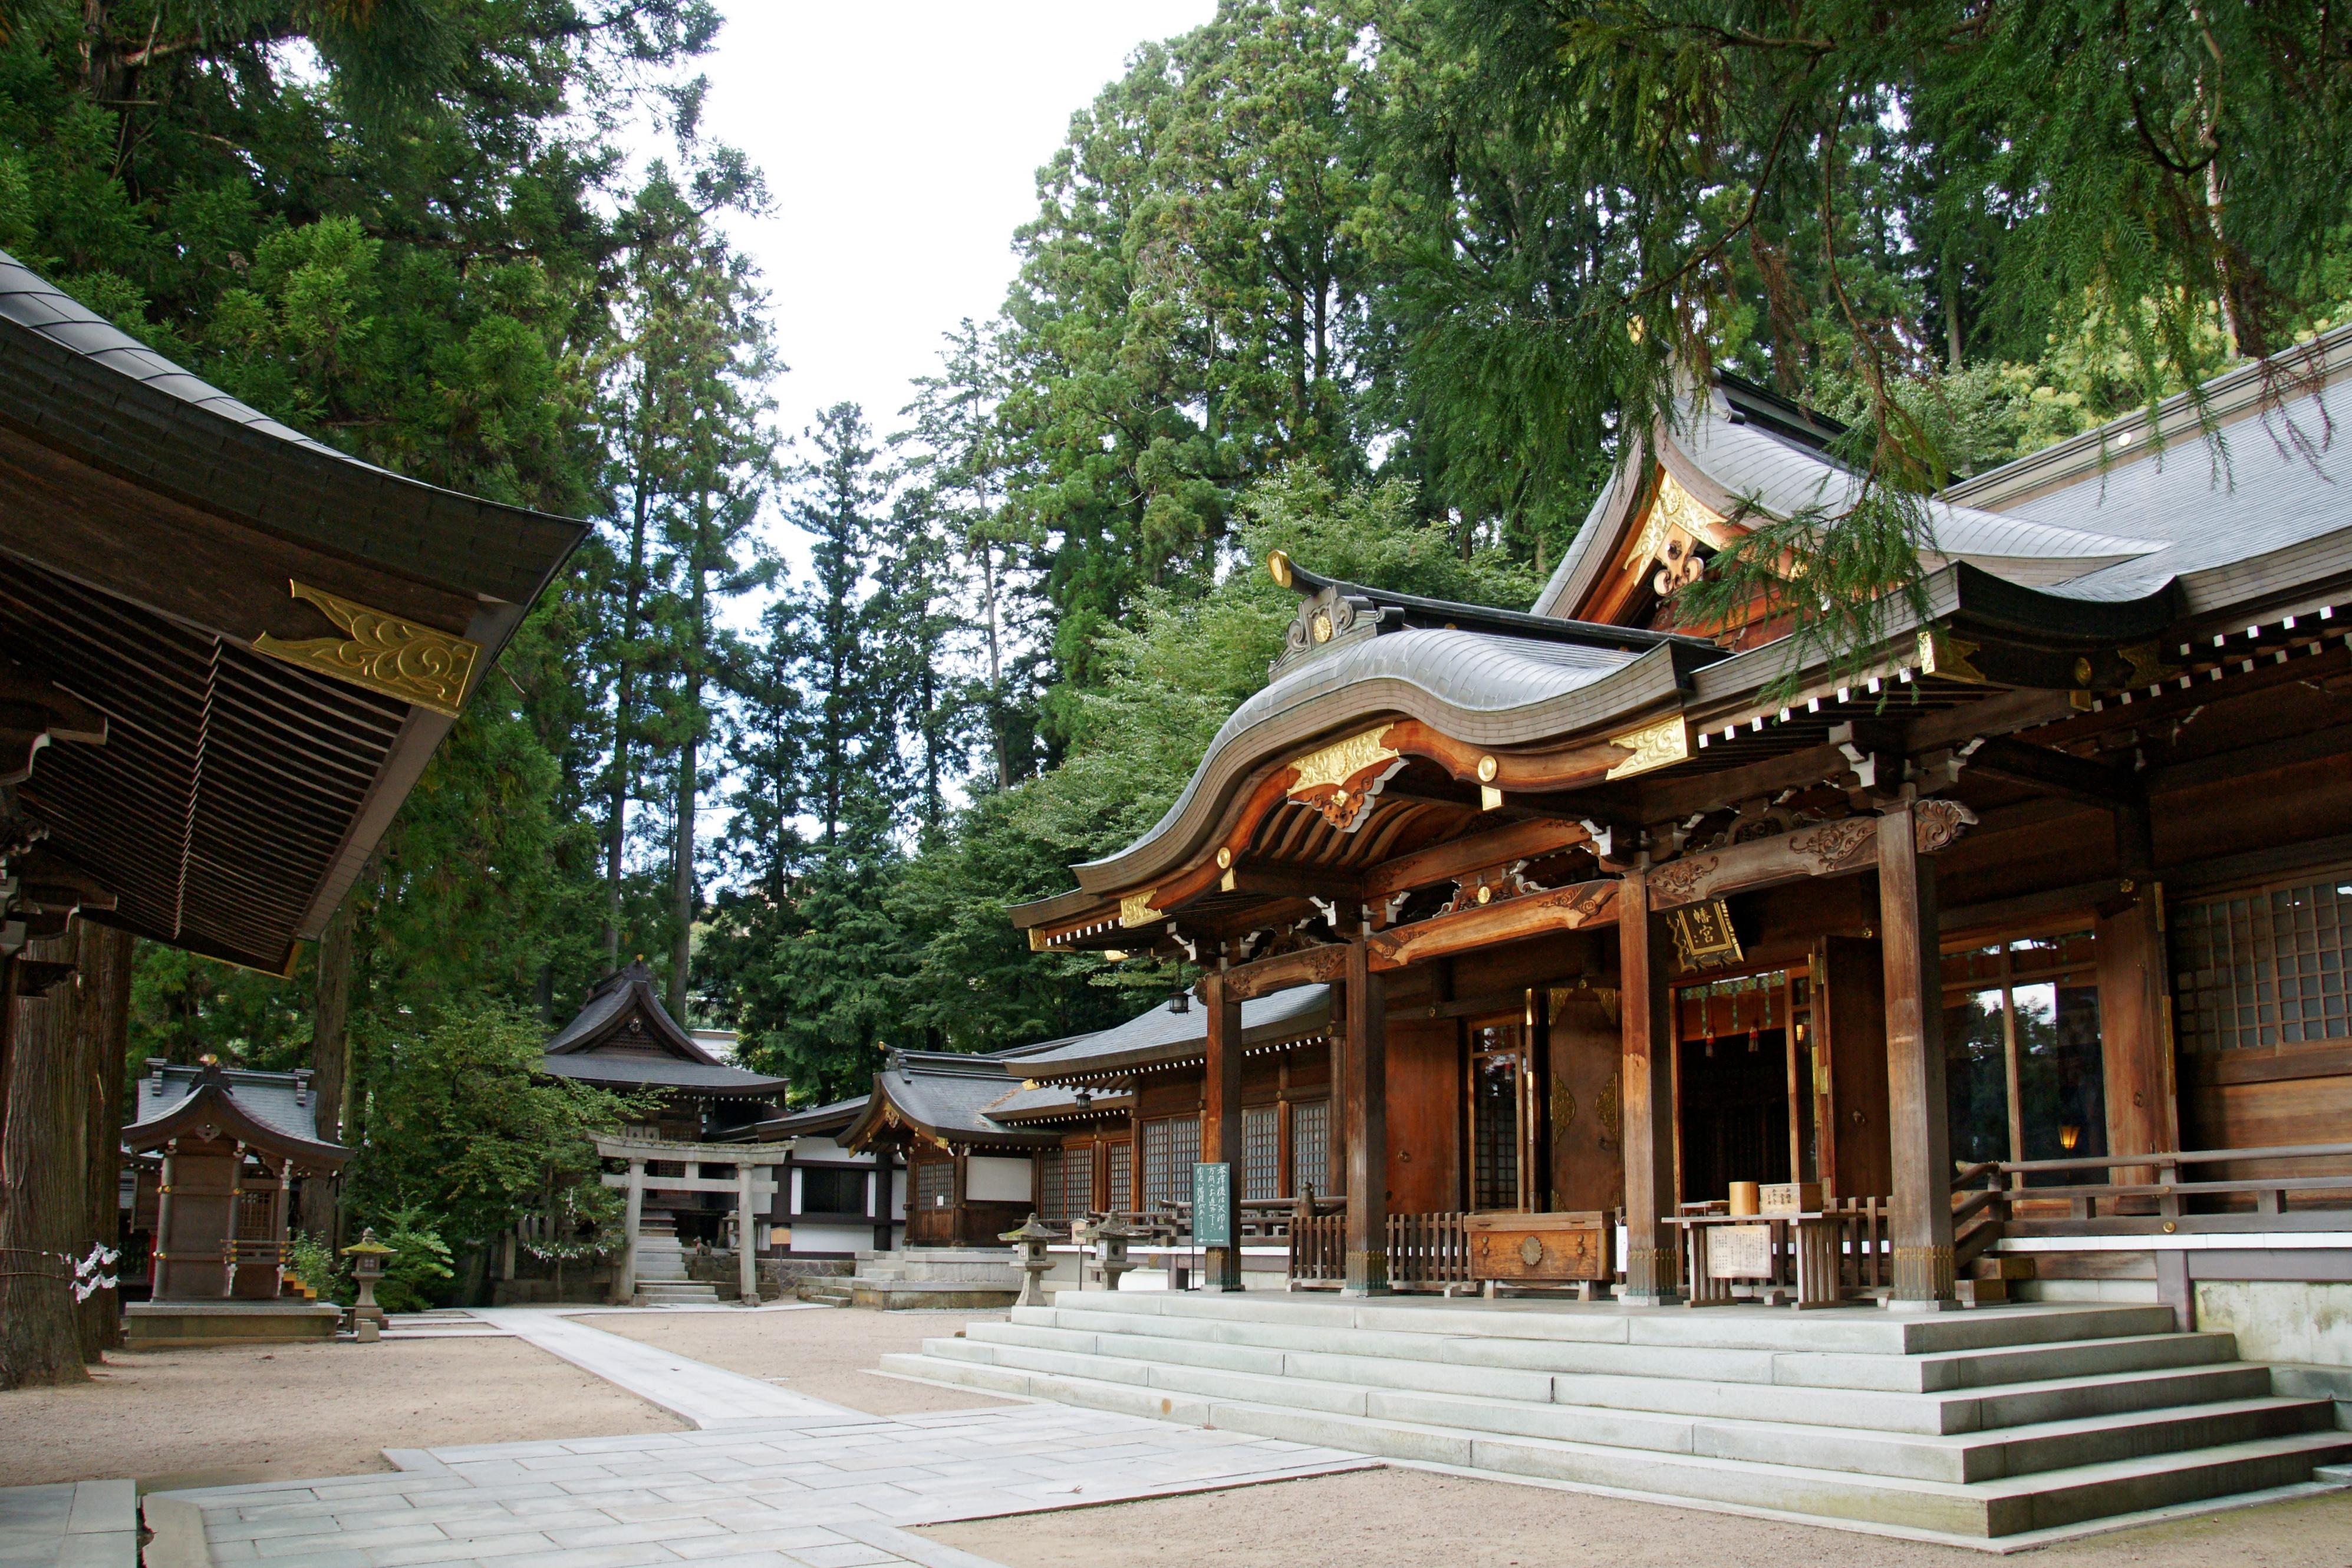 Las Villas Sakurayama-hachimangu_Takayama_Gifu_pref04s3s3990